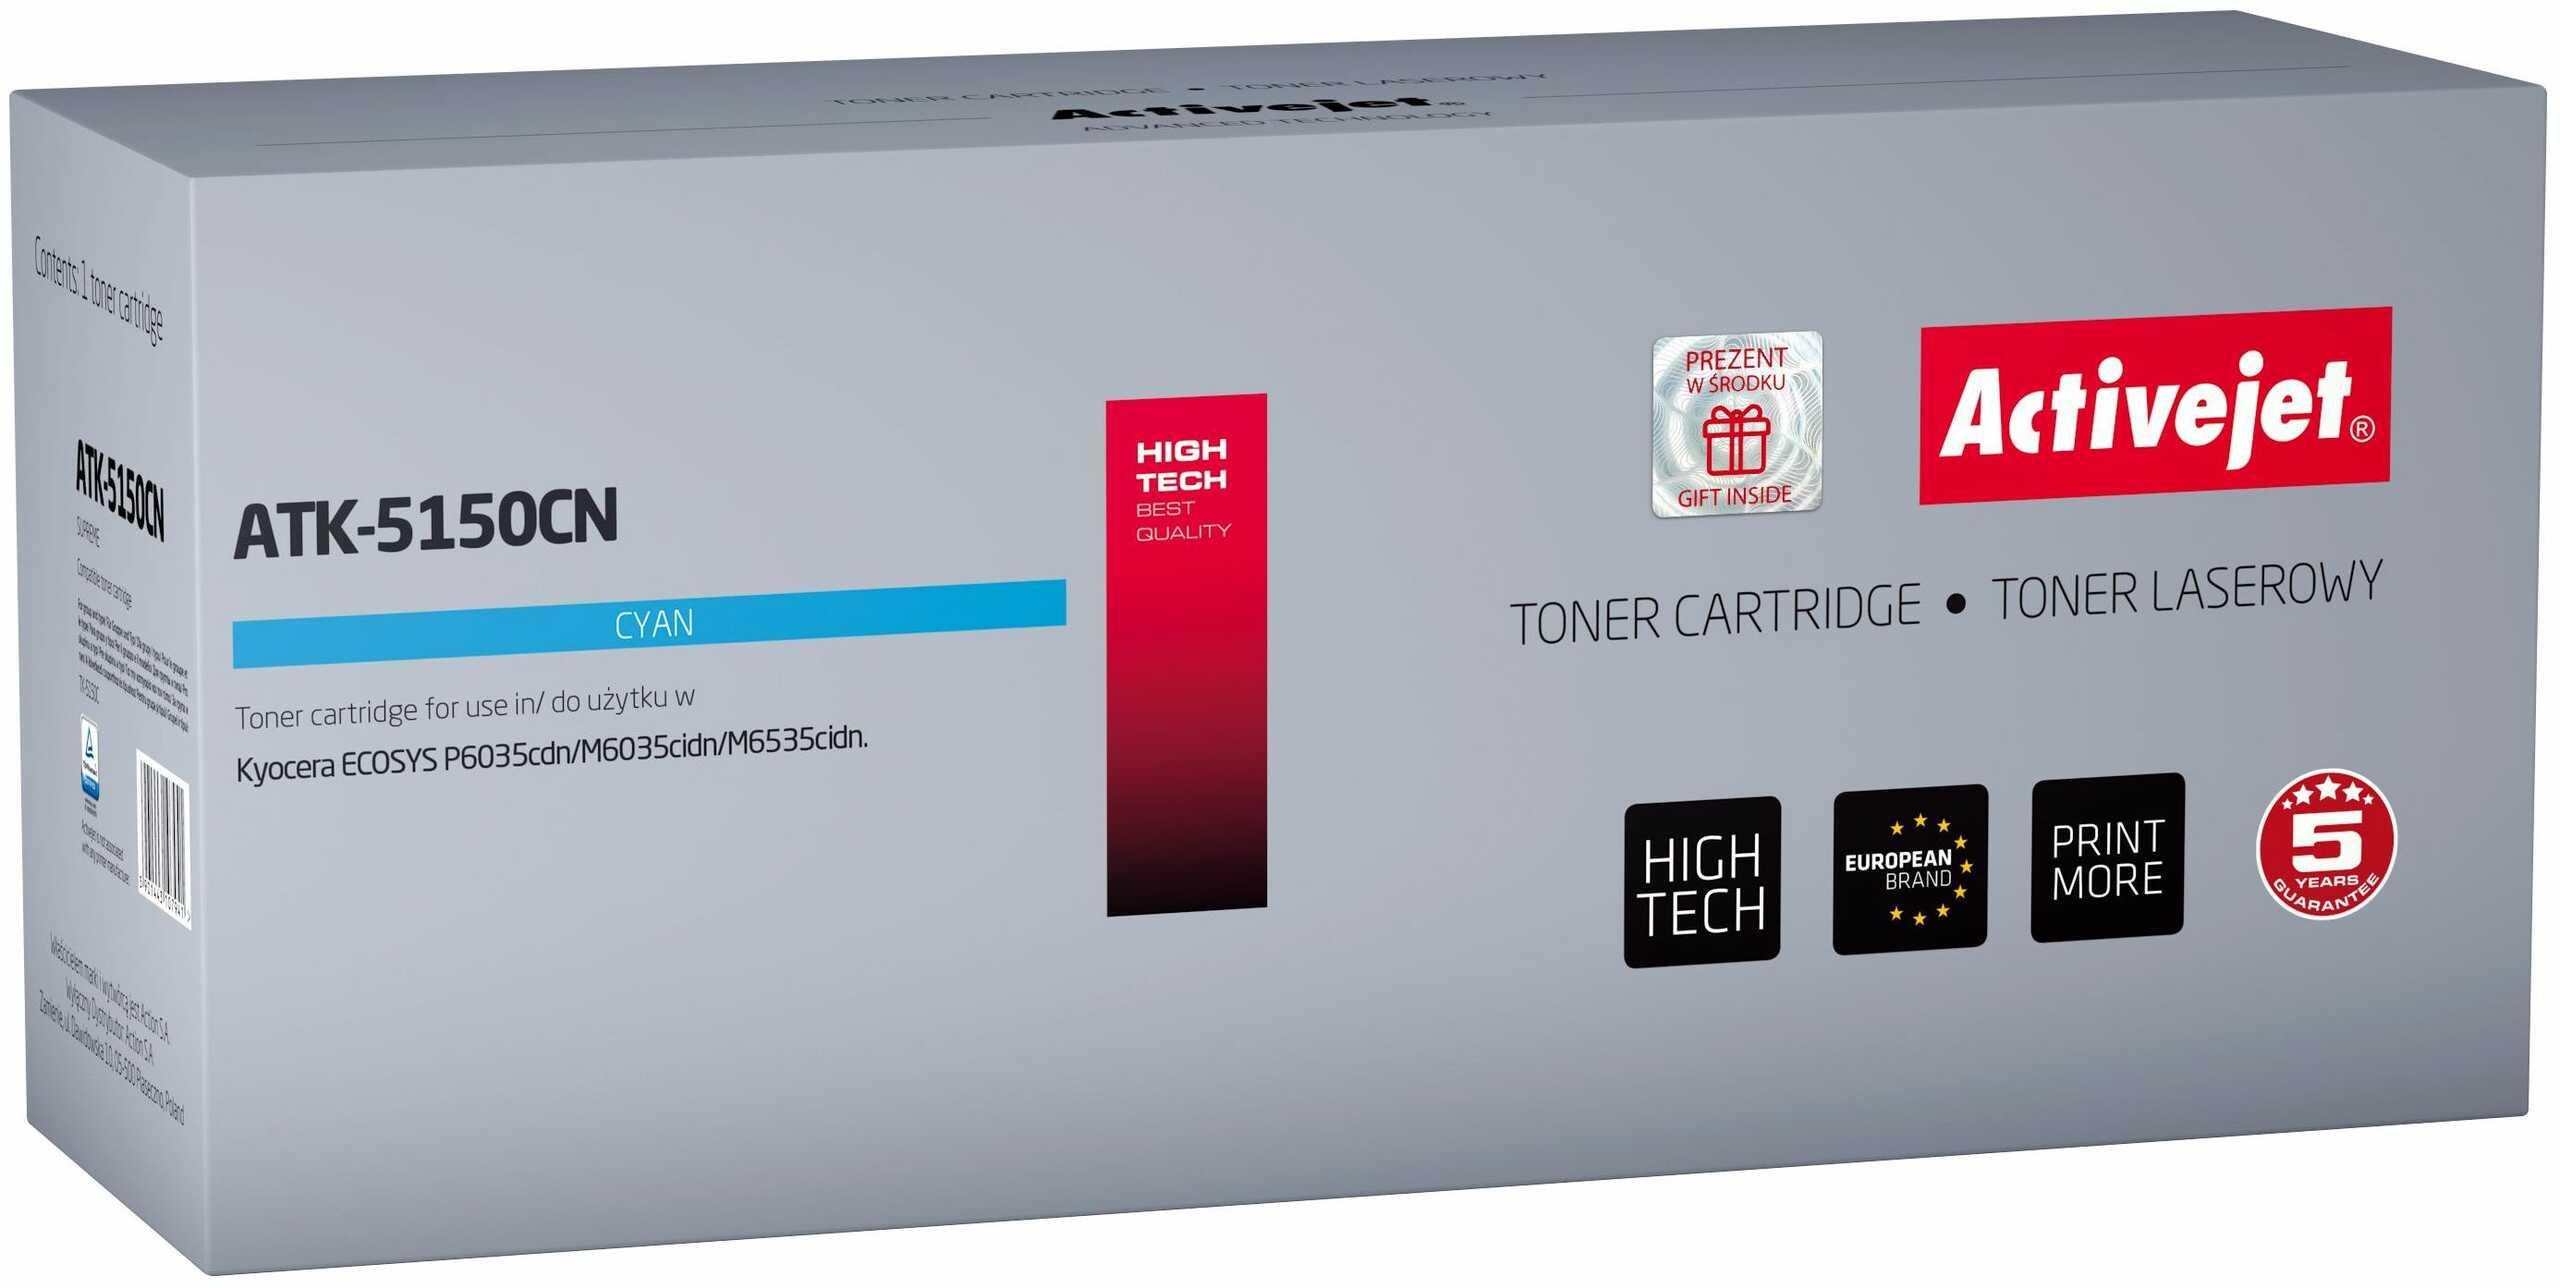 Toner Activejet ATK-5150CN (zamiennik Kyocera TK-5150C; Supreme; 10 000 stron; niebieski)